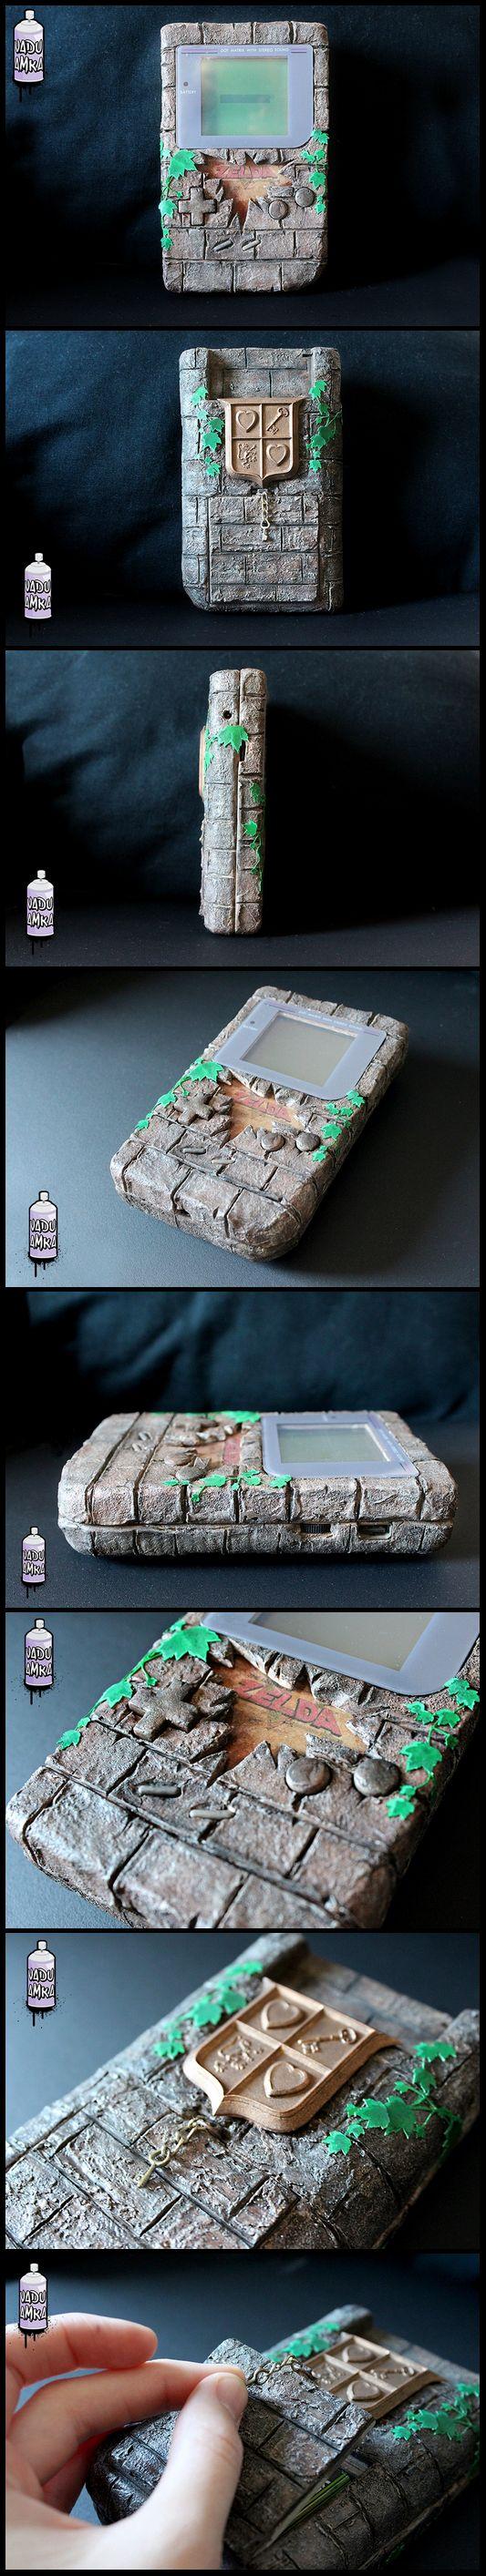 "Custom Game Boy Zelda - ""Brick"" Nes edition x Game Watch by Vadu Amka from Belgium"